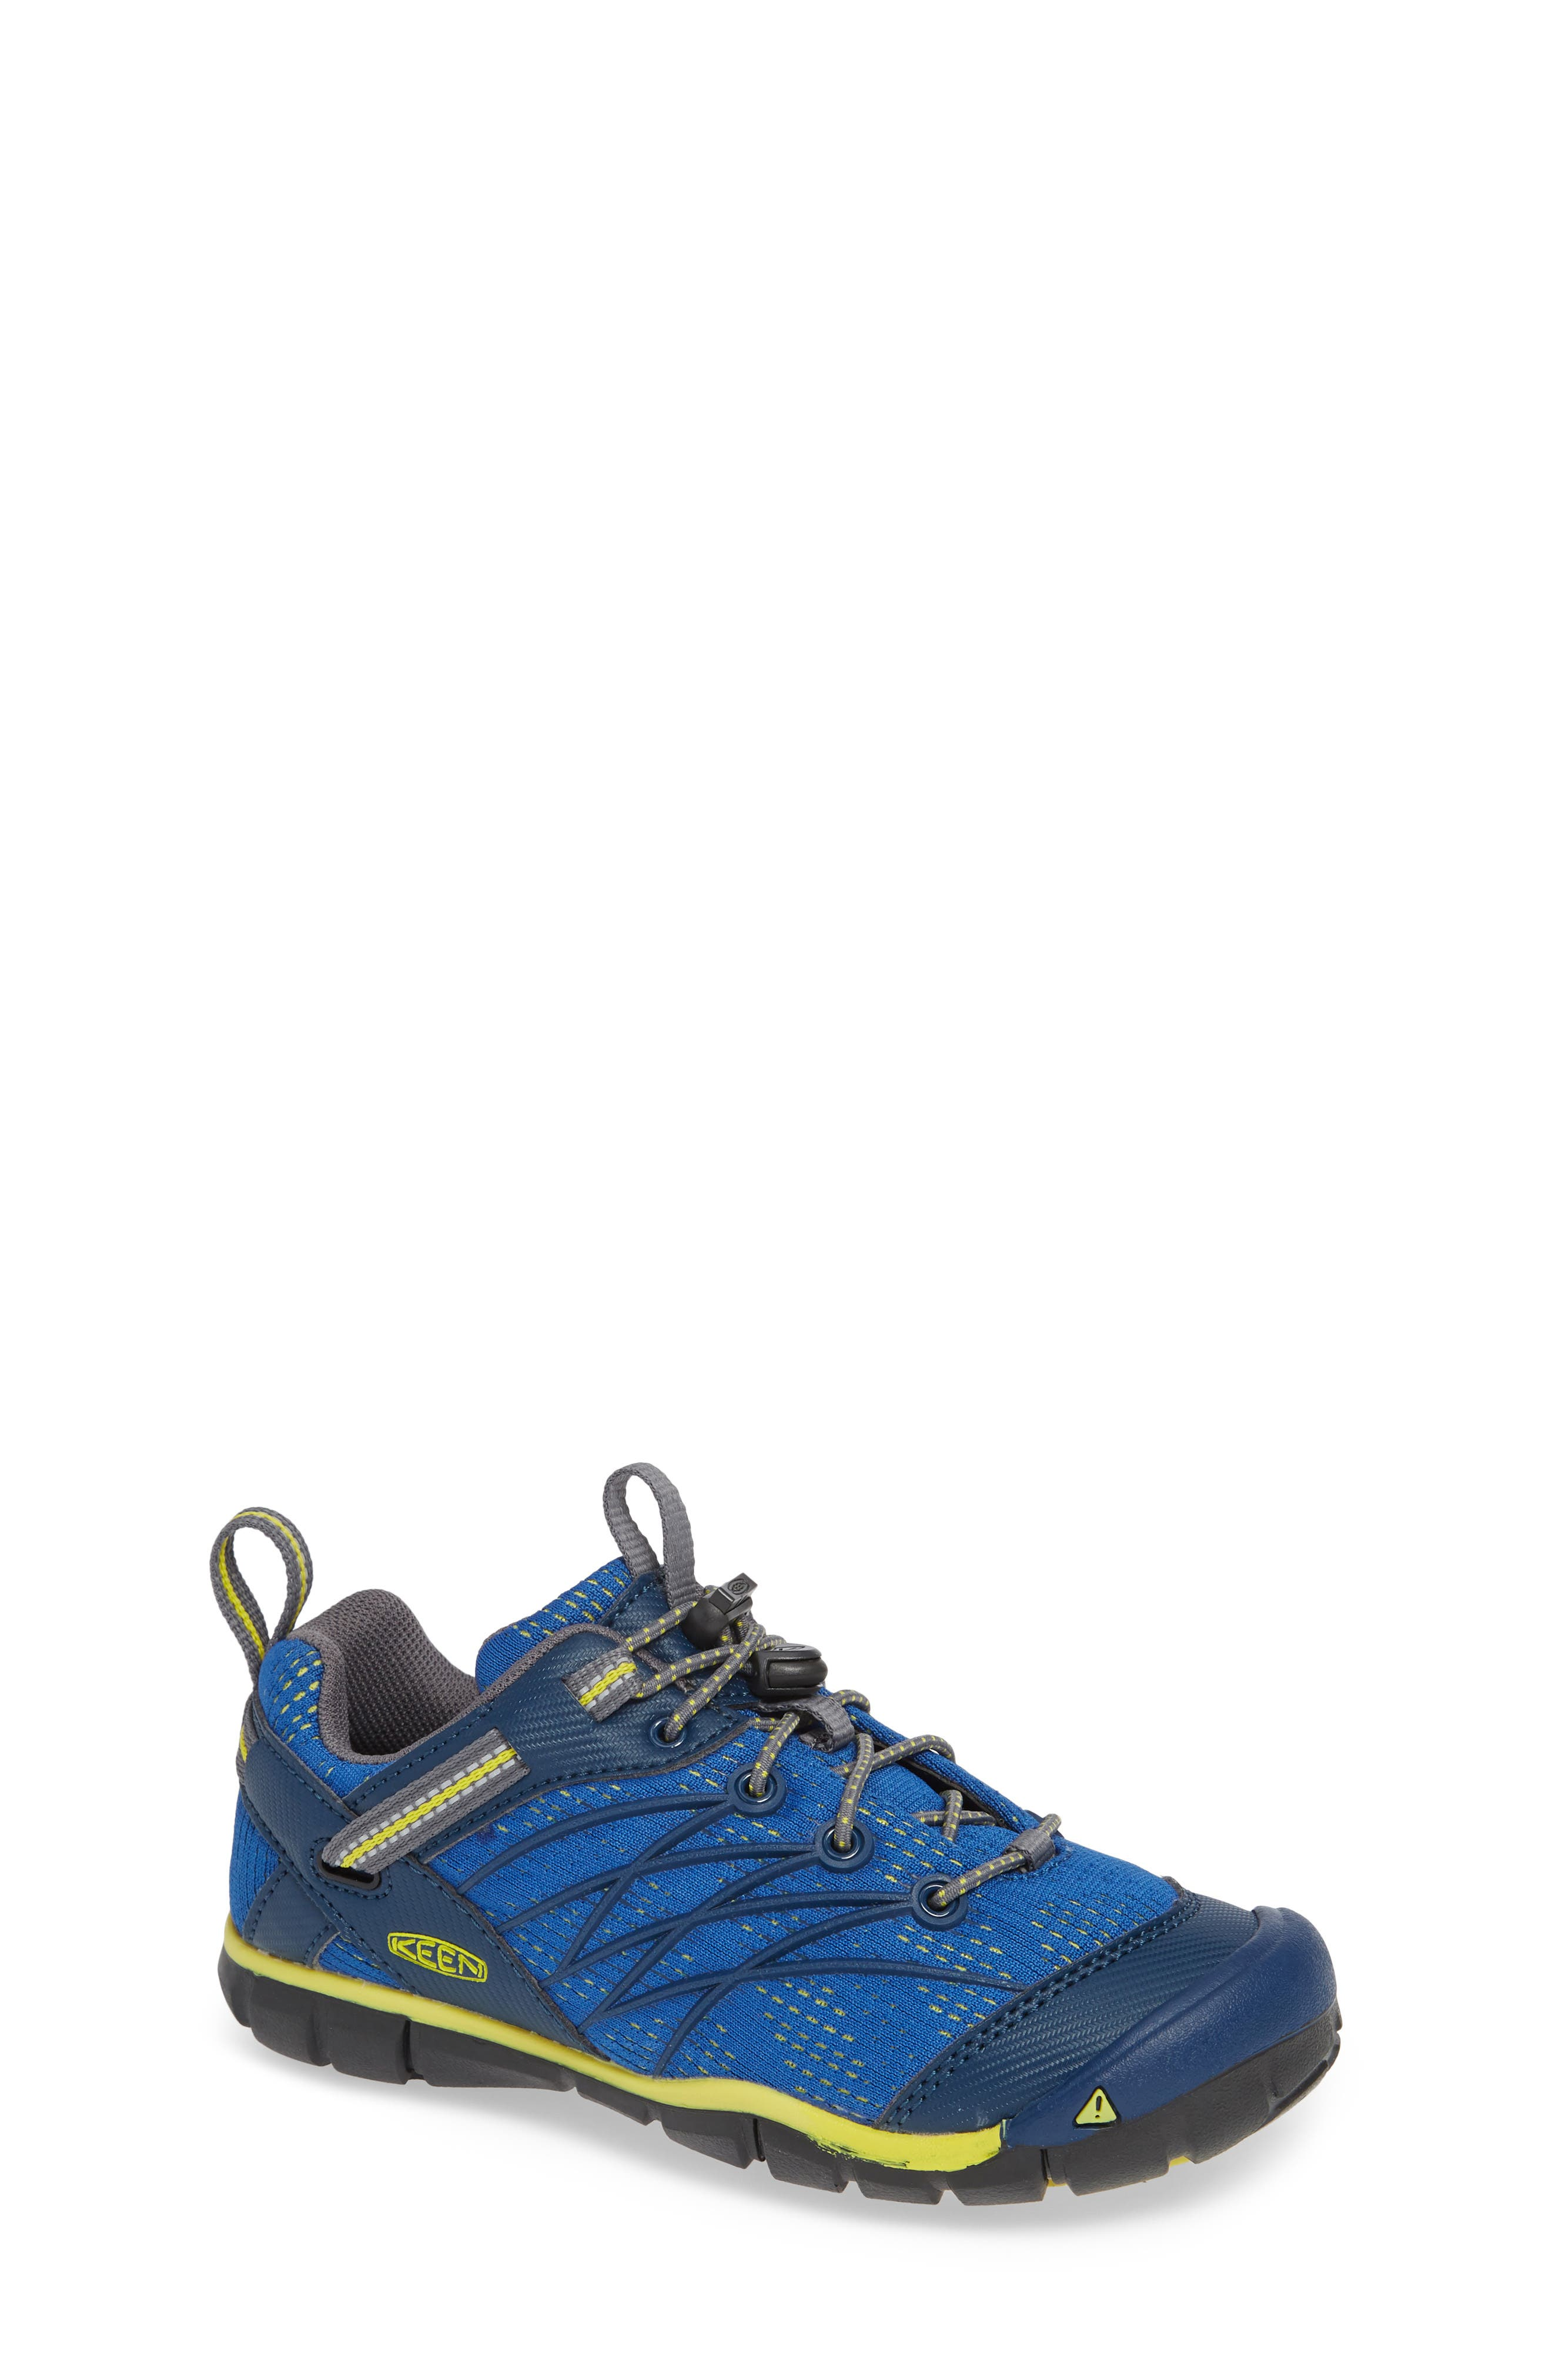 KEEN, 'Chandler CNX' Water Friendly Sneaker, Main thumbnail 1, color, BLUE OPAL/ BLUE